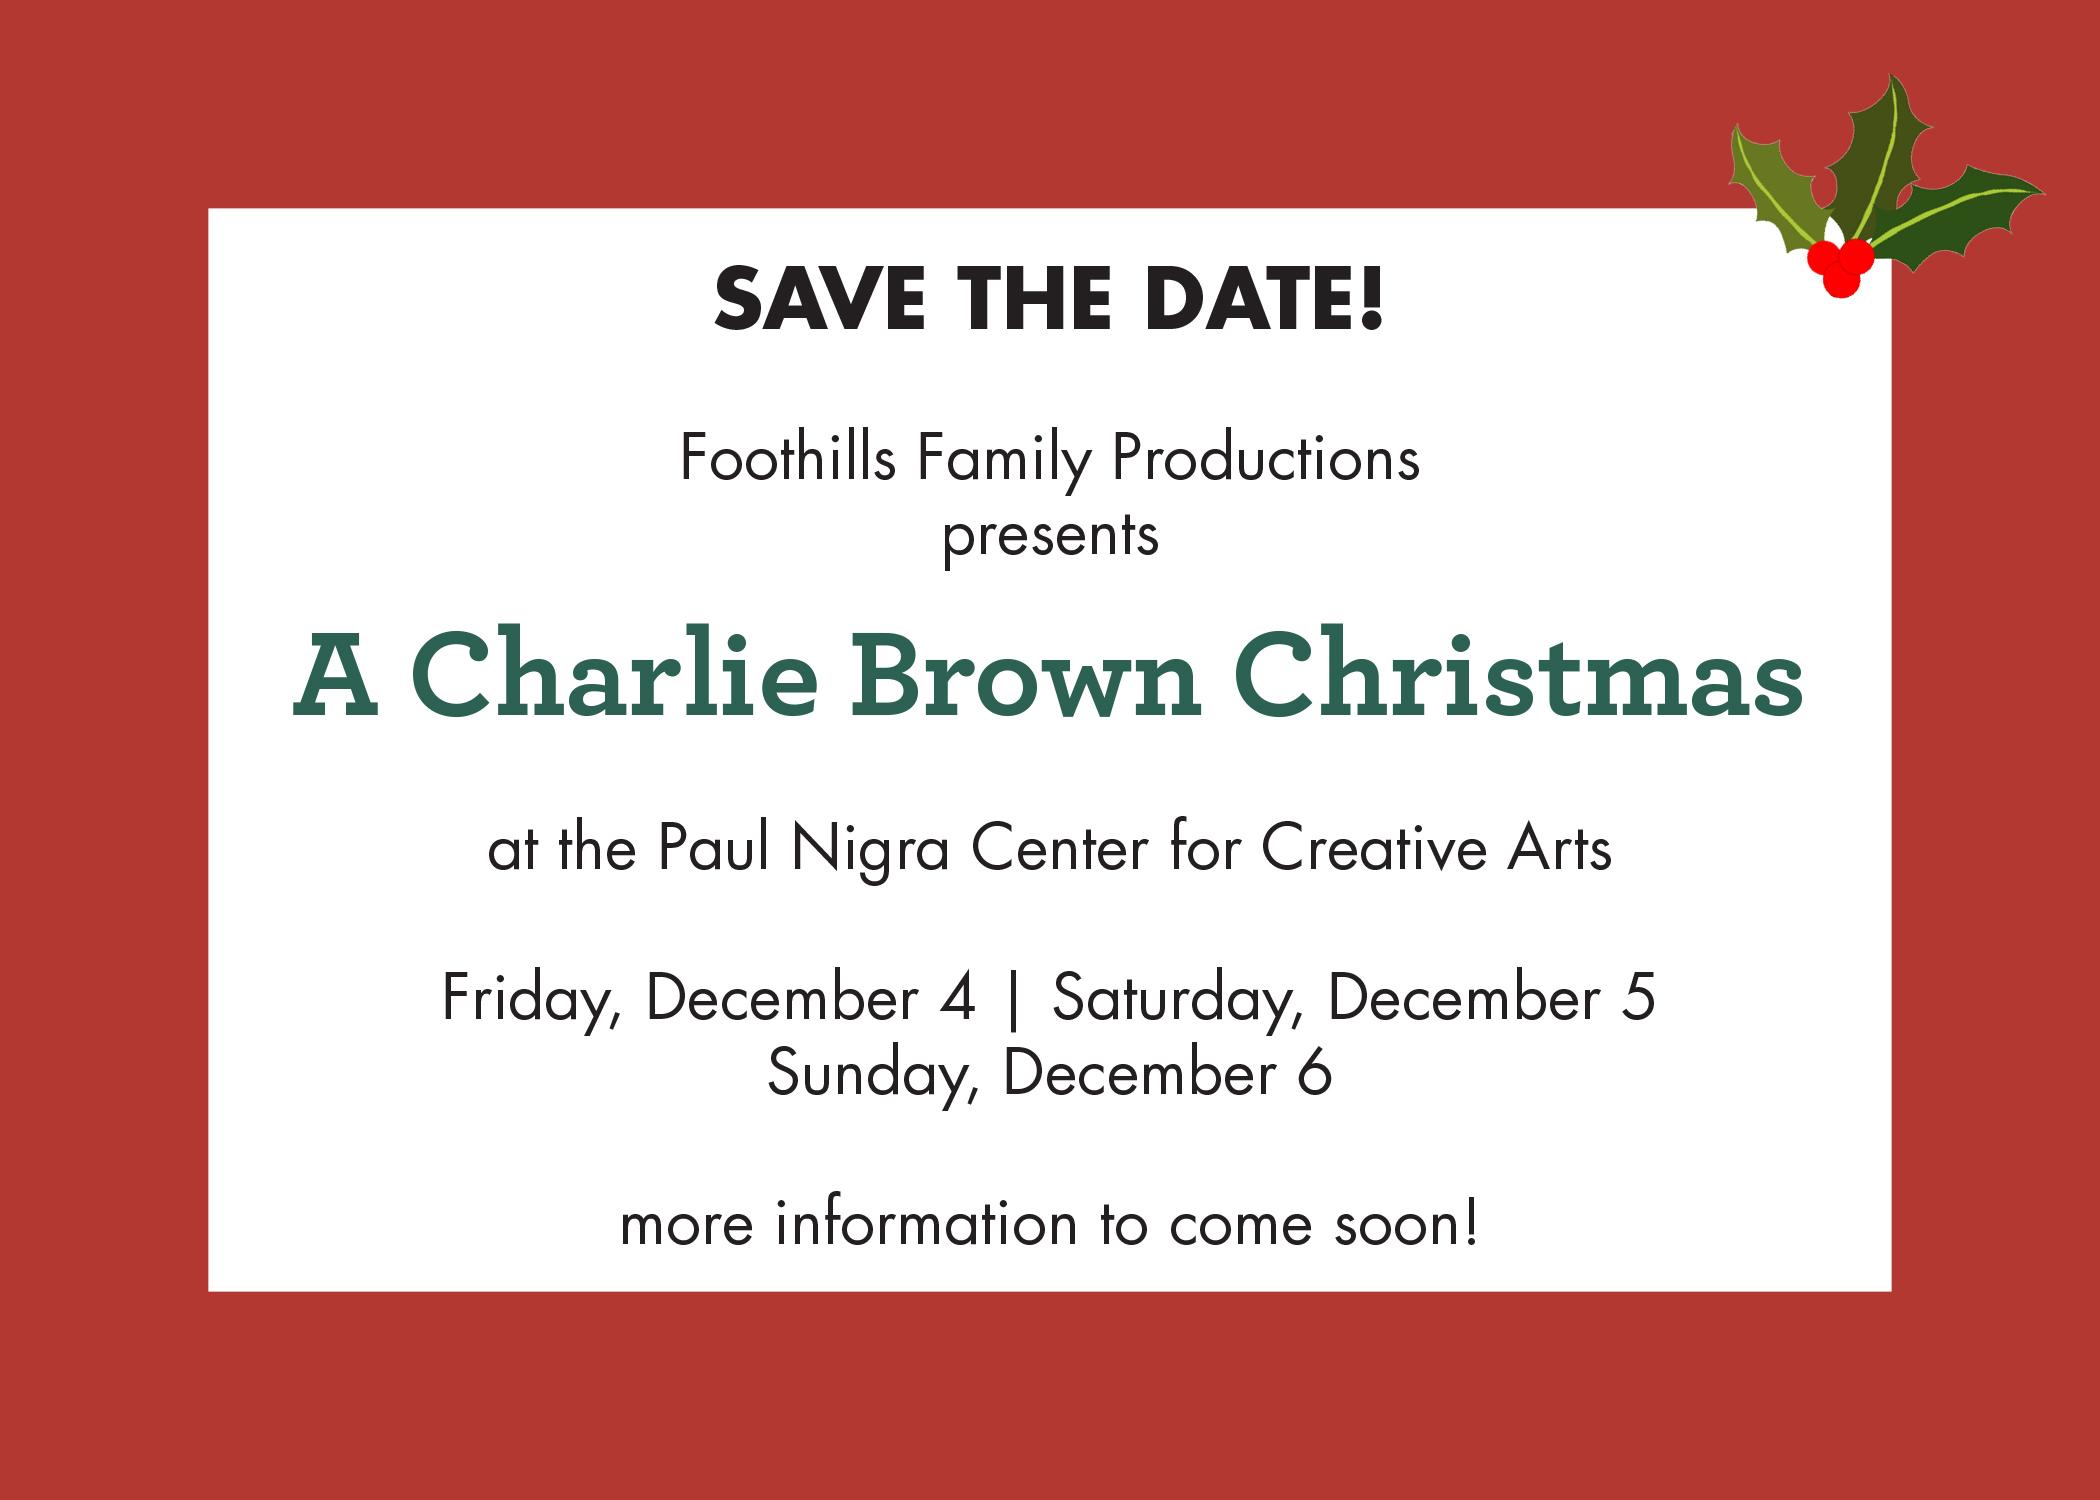 charlie brown christmas.jpg